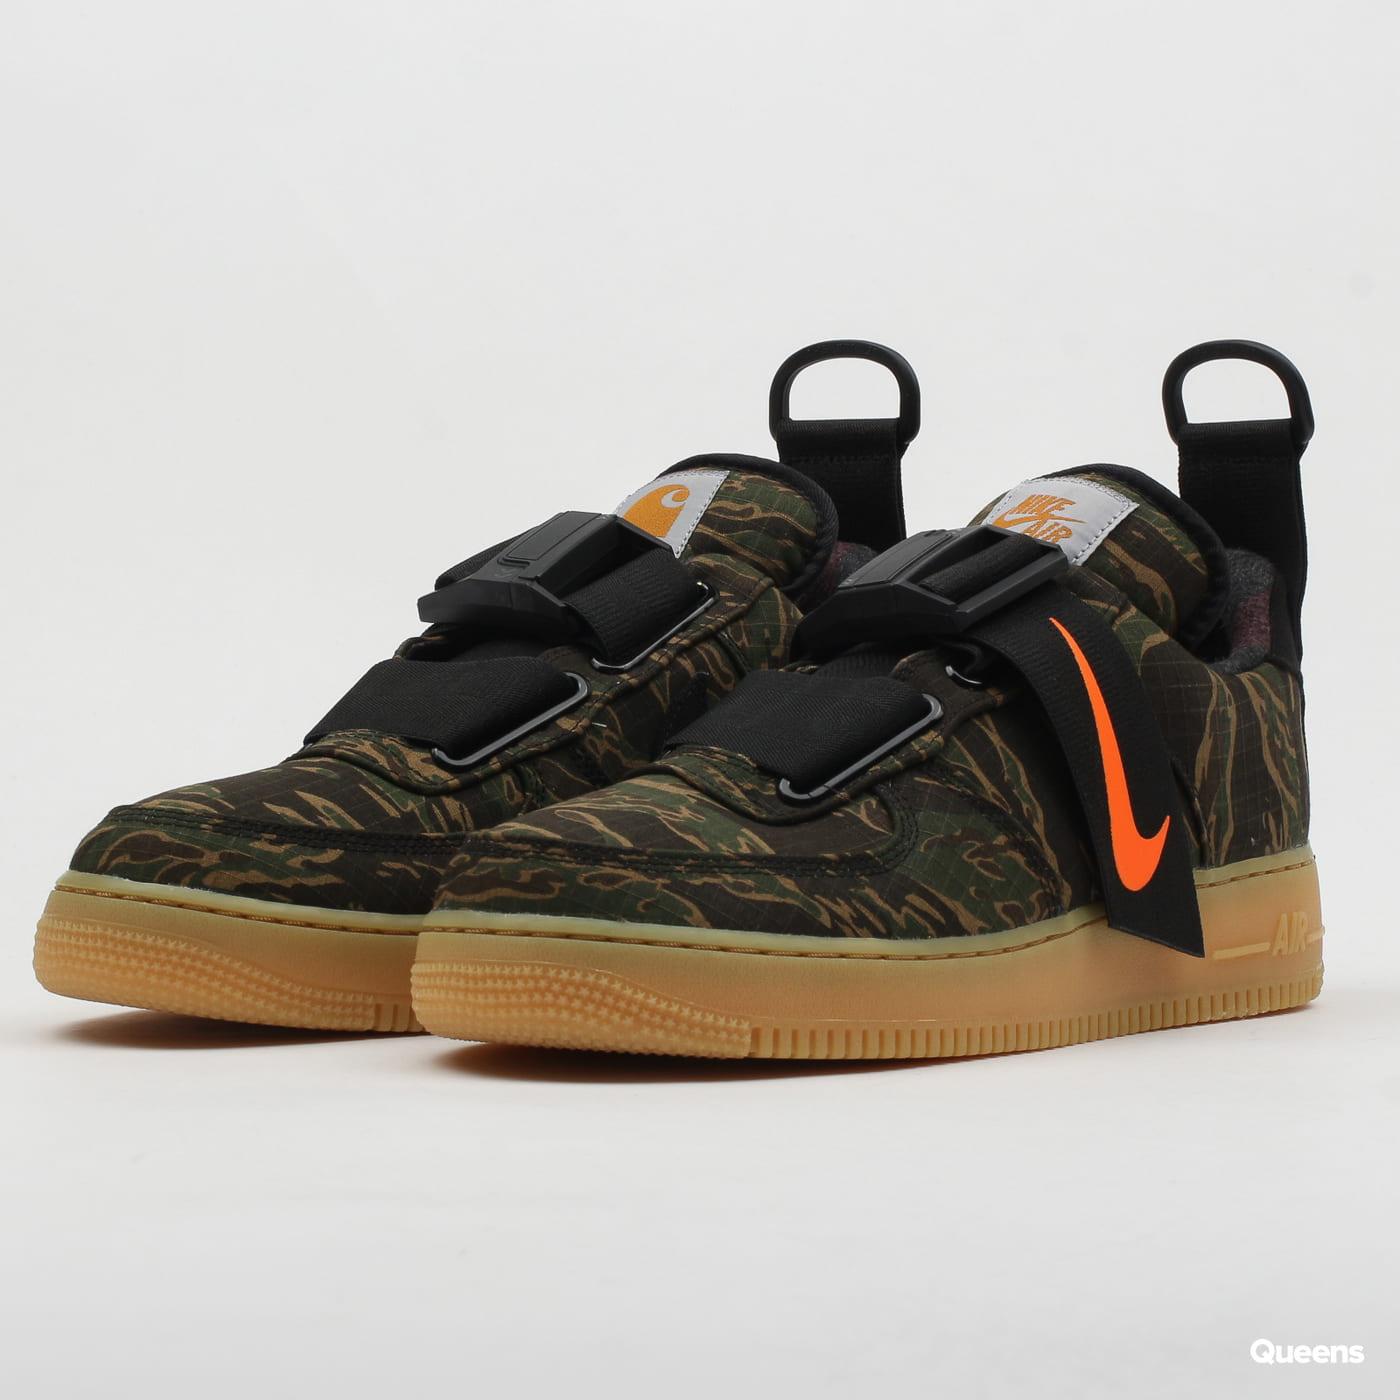 Obuv Nike Nike x Carhartt WIP Air Force 1 UT LOW PRM (AV4112-300)– Queens 💚 193dfe9e327